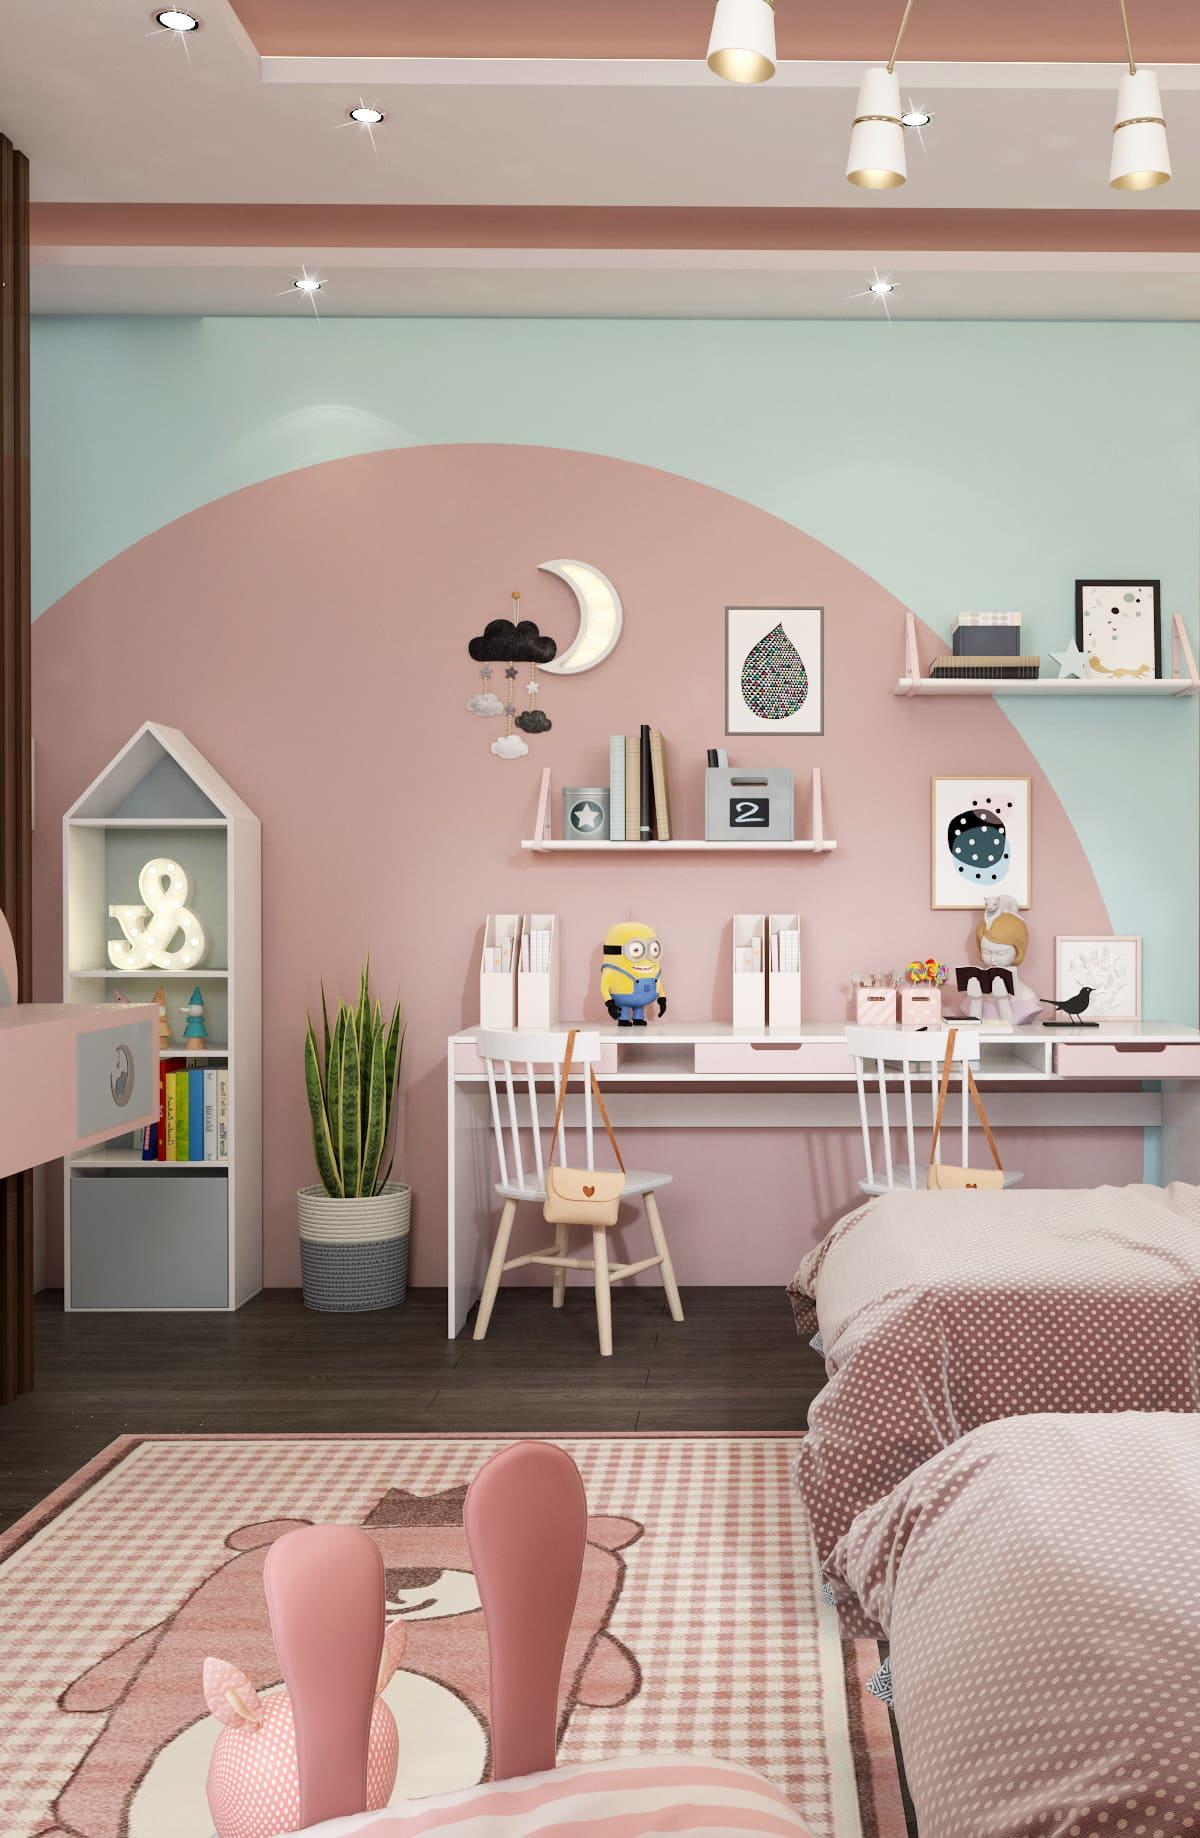 интерьер детской комнаты фото 88